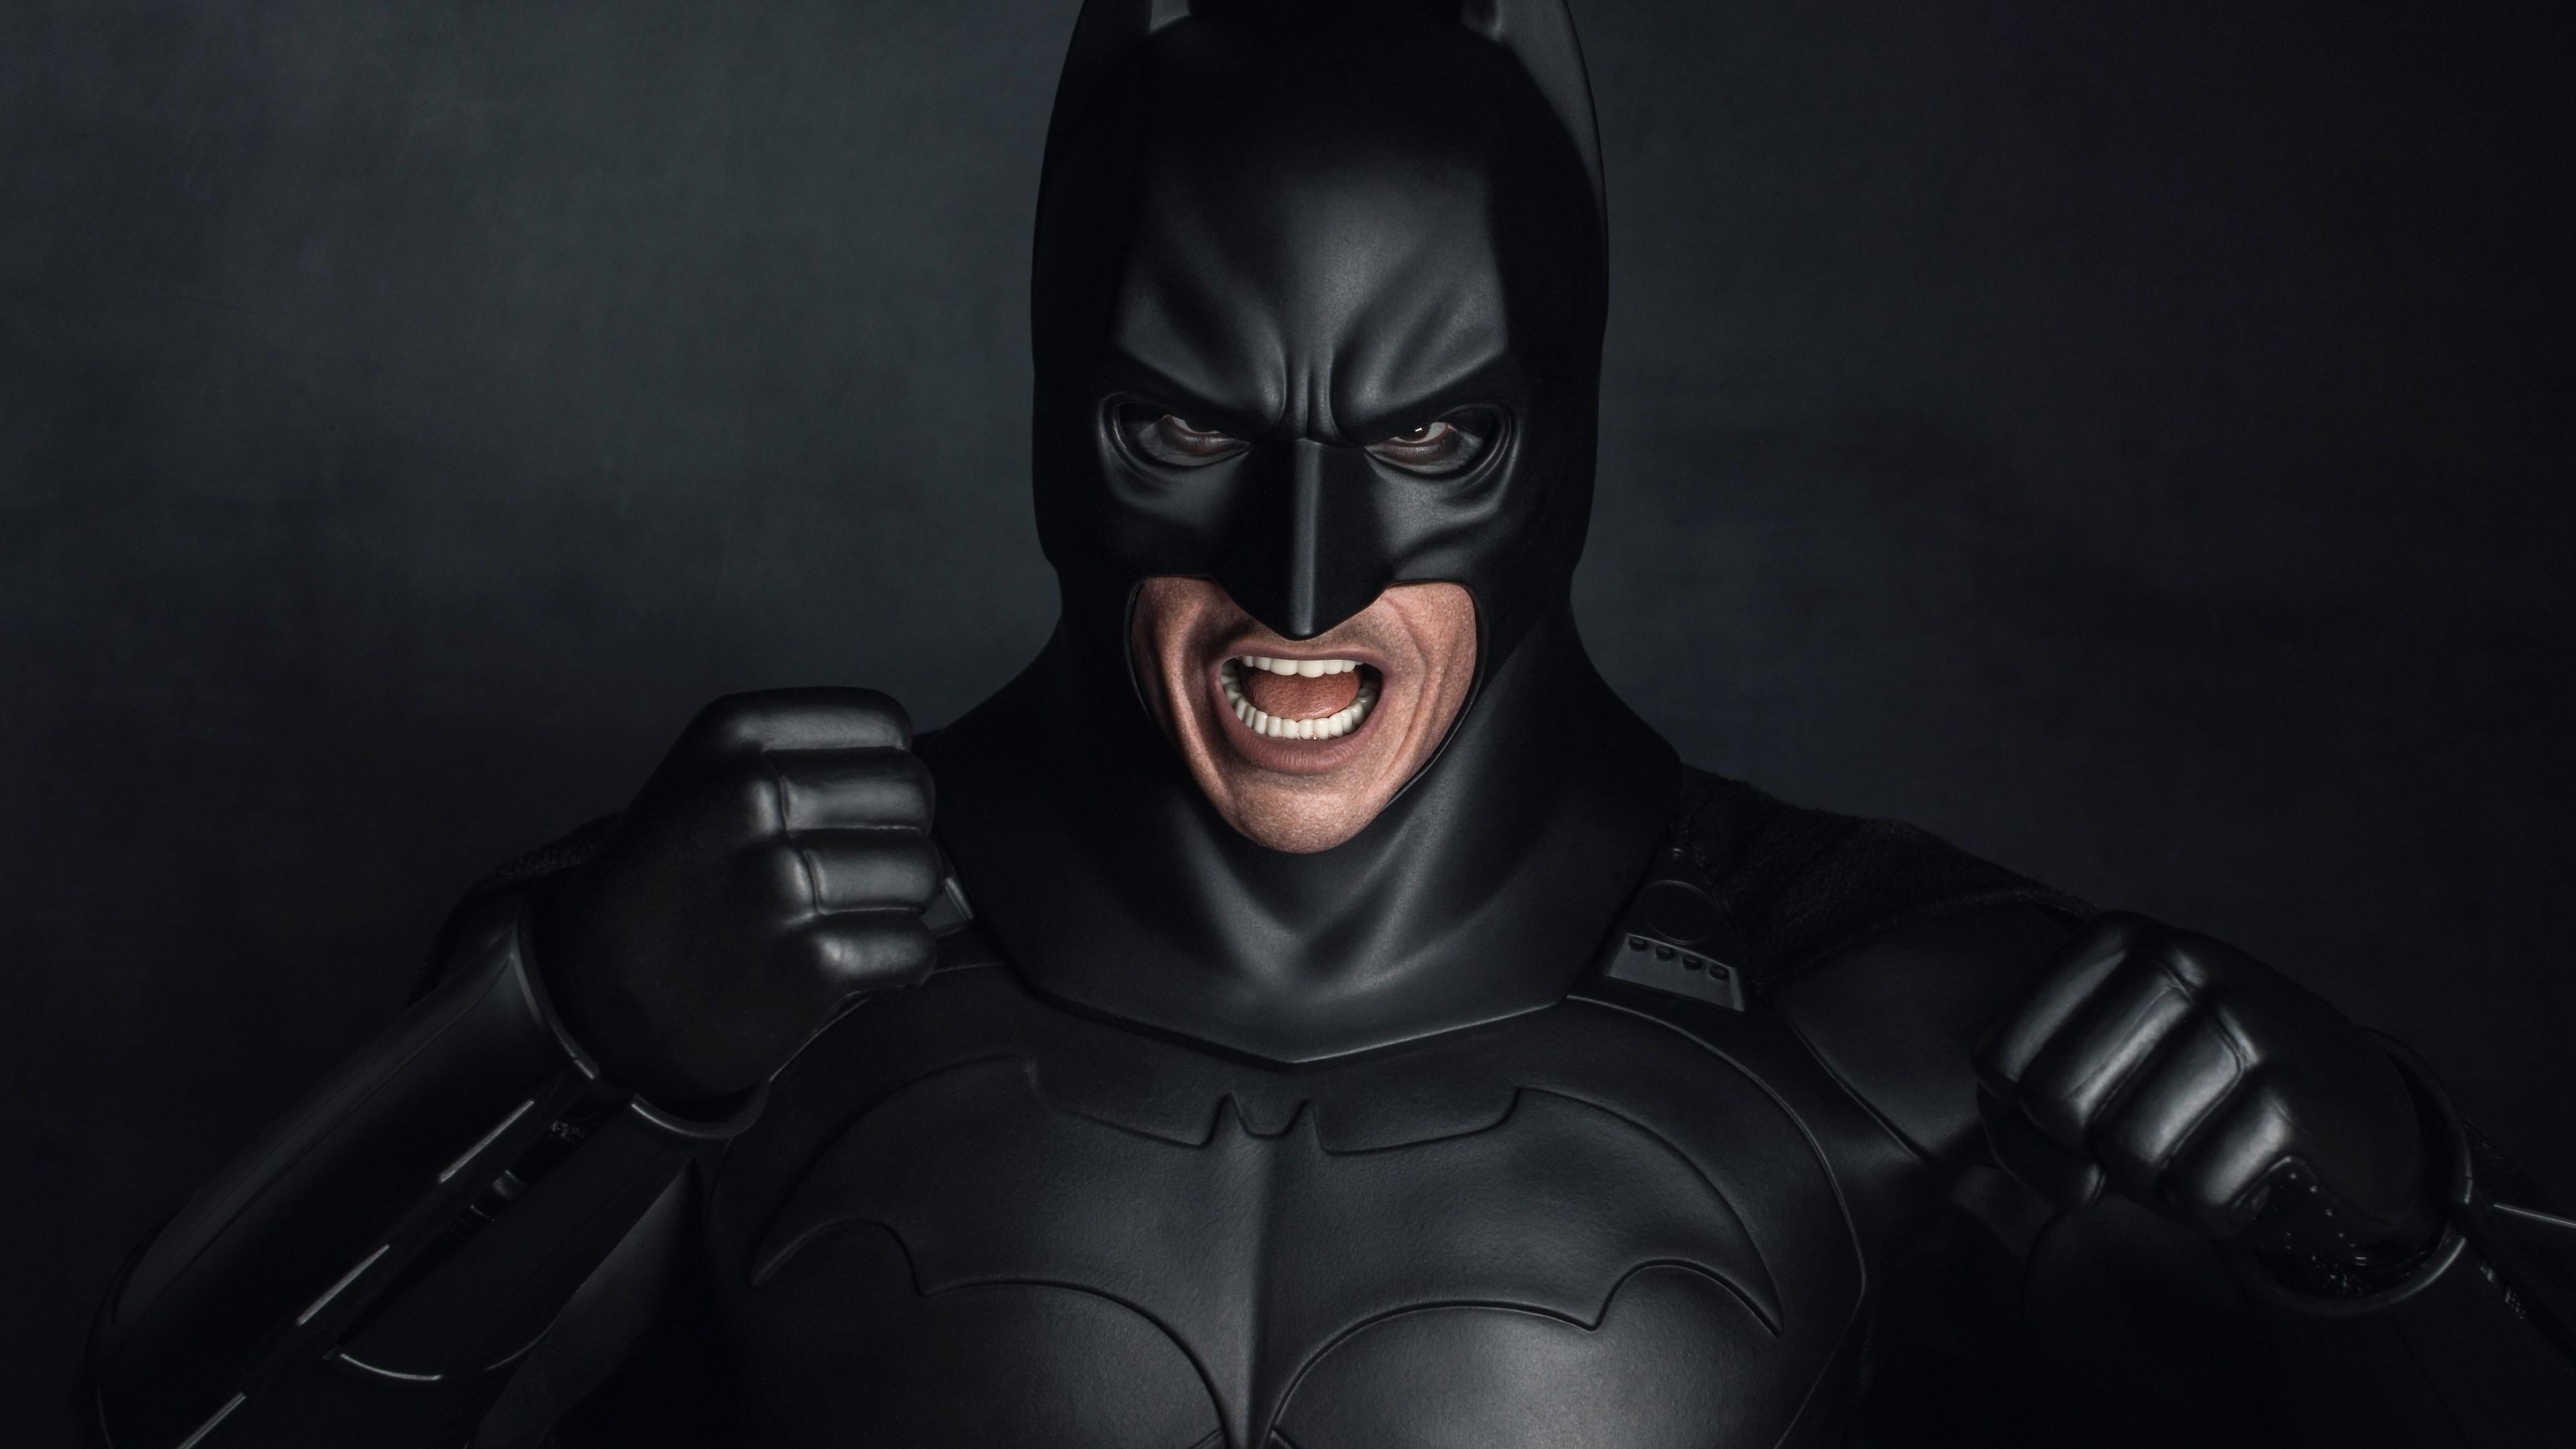 Wallpaper 4k Batman Begins 4k New 4k Wallpapers Batman